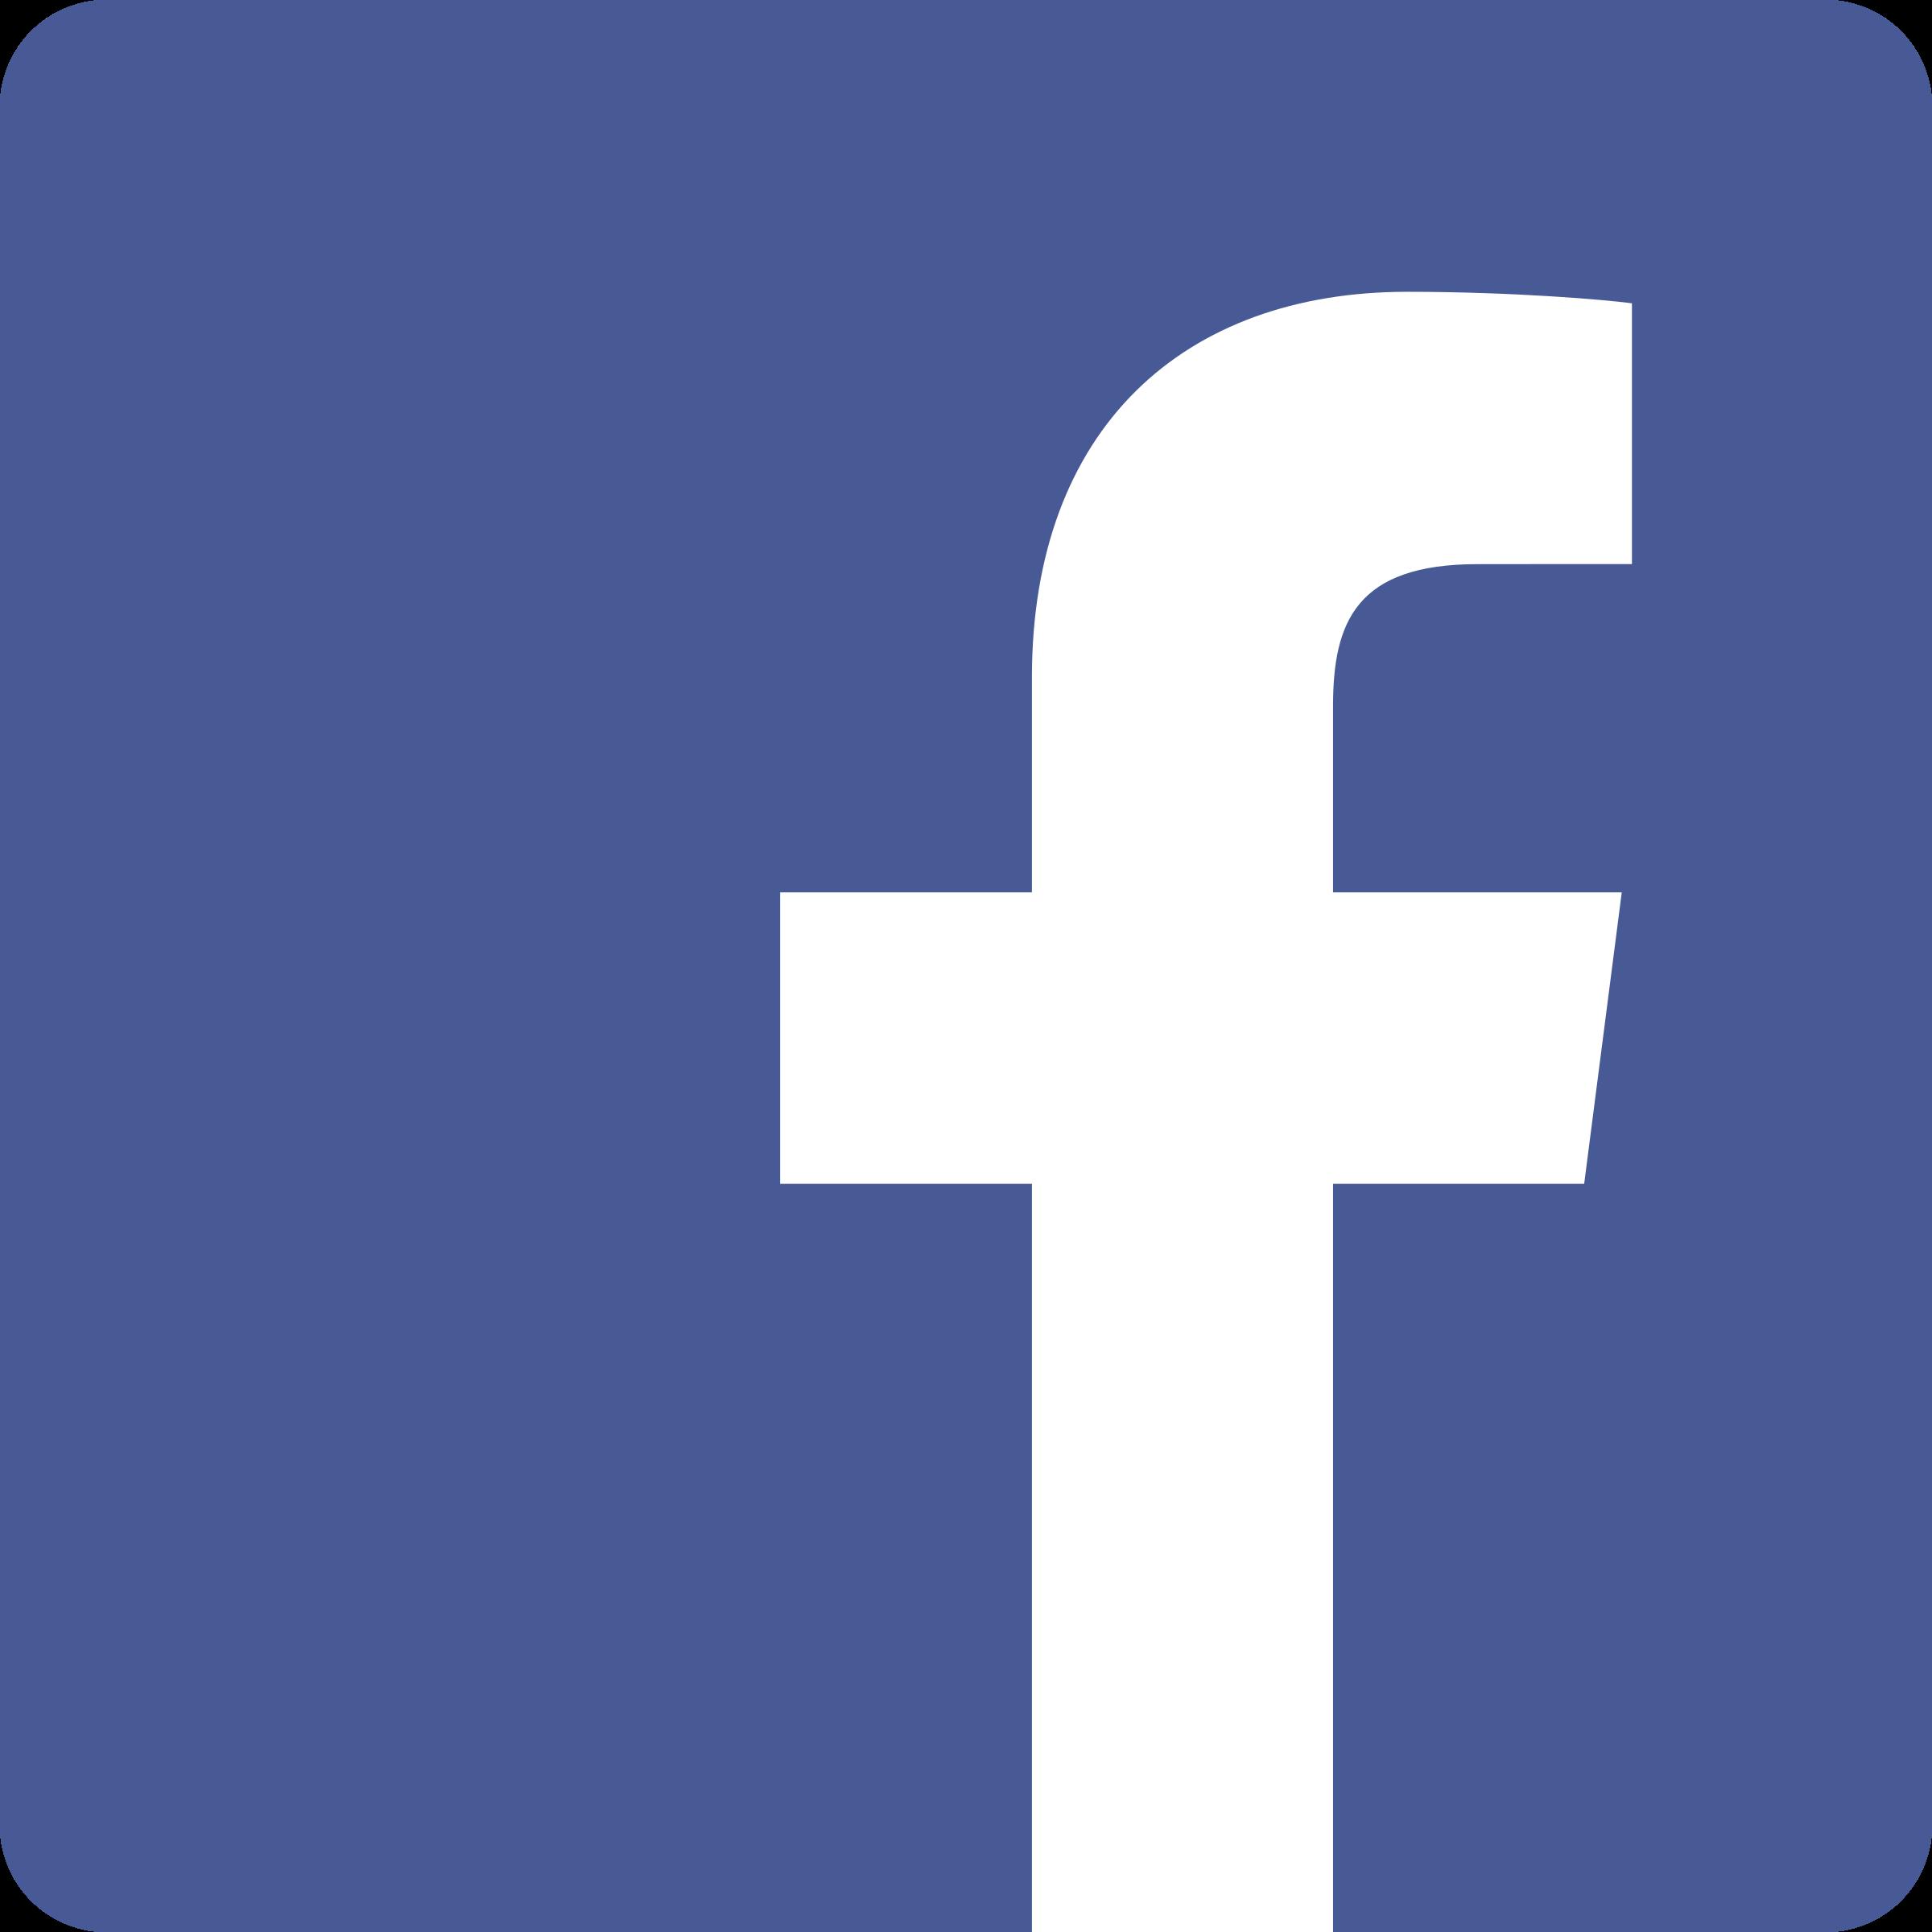 2400x2400 Facebook Icon Logo Svg Vector Amp Png Transparent